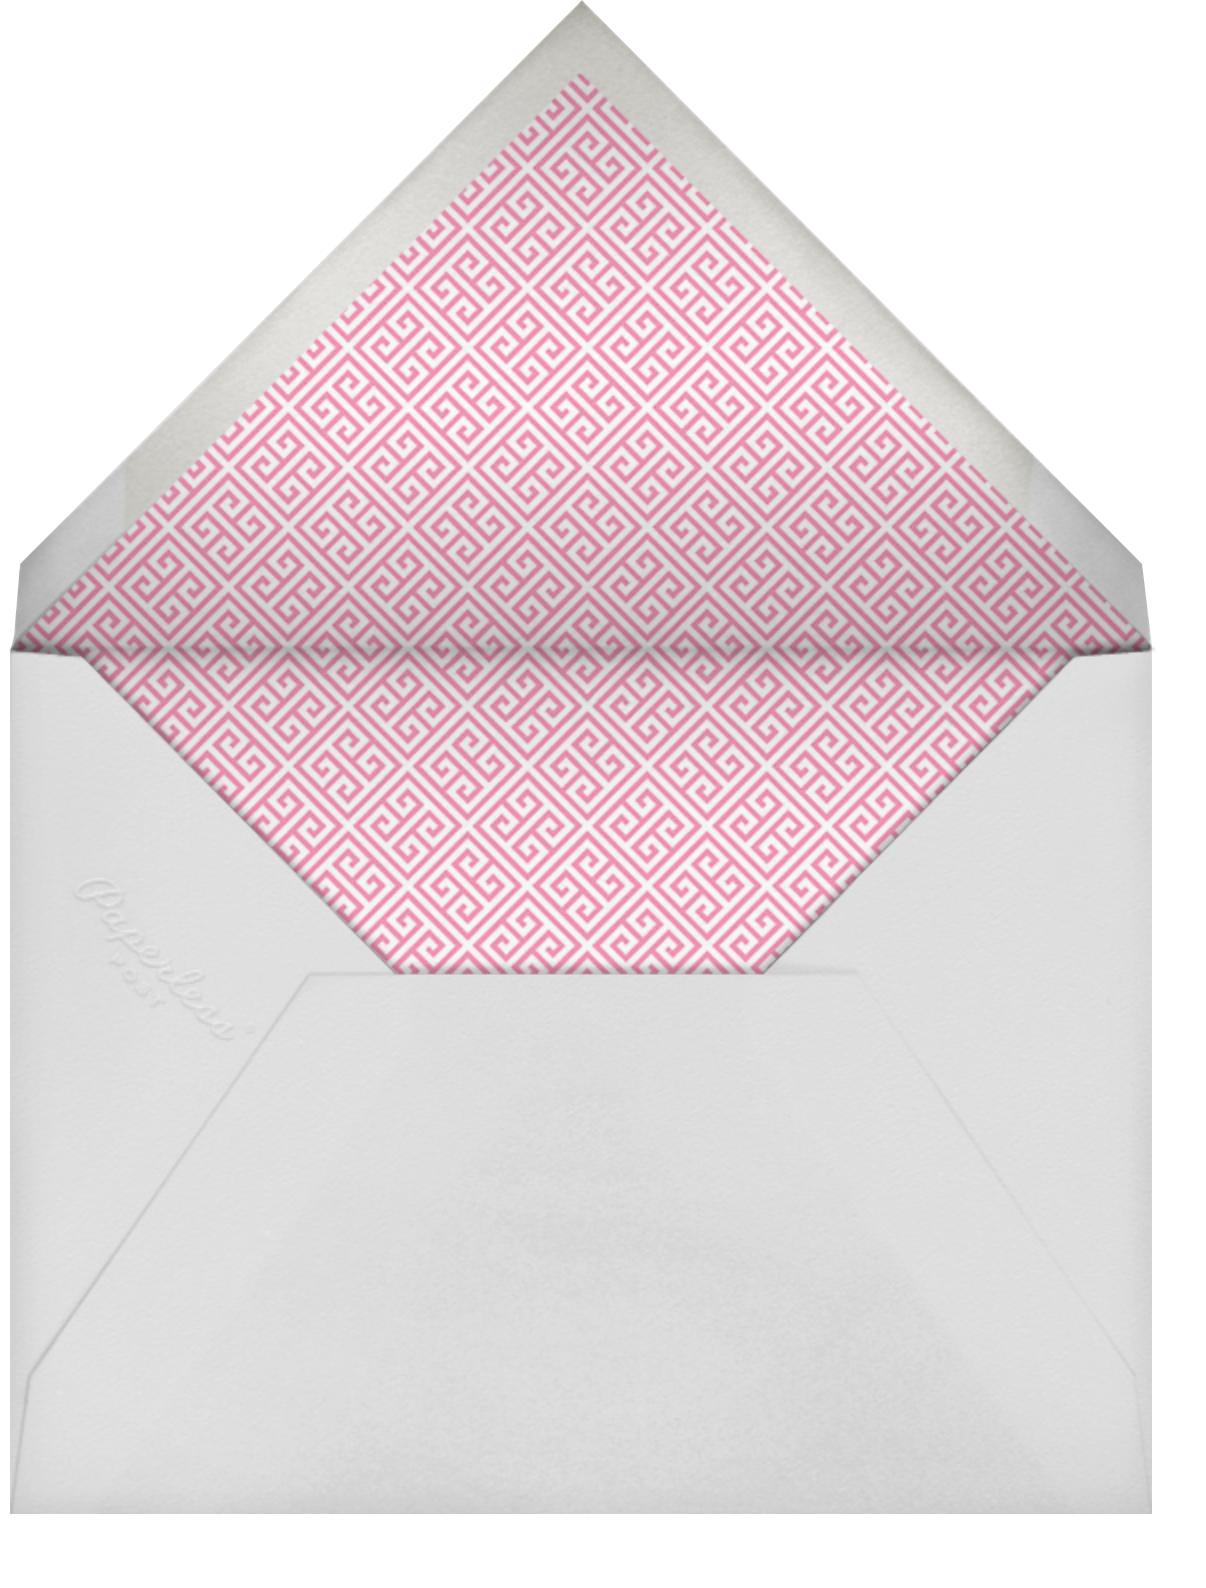 Baby Elephant - Pink - Jonathan Adler - Envelope